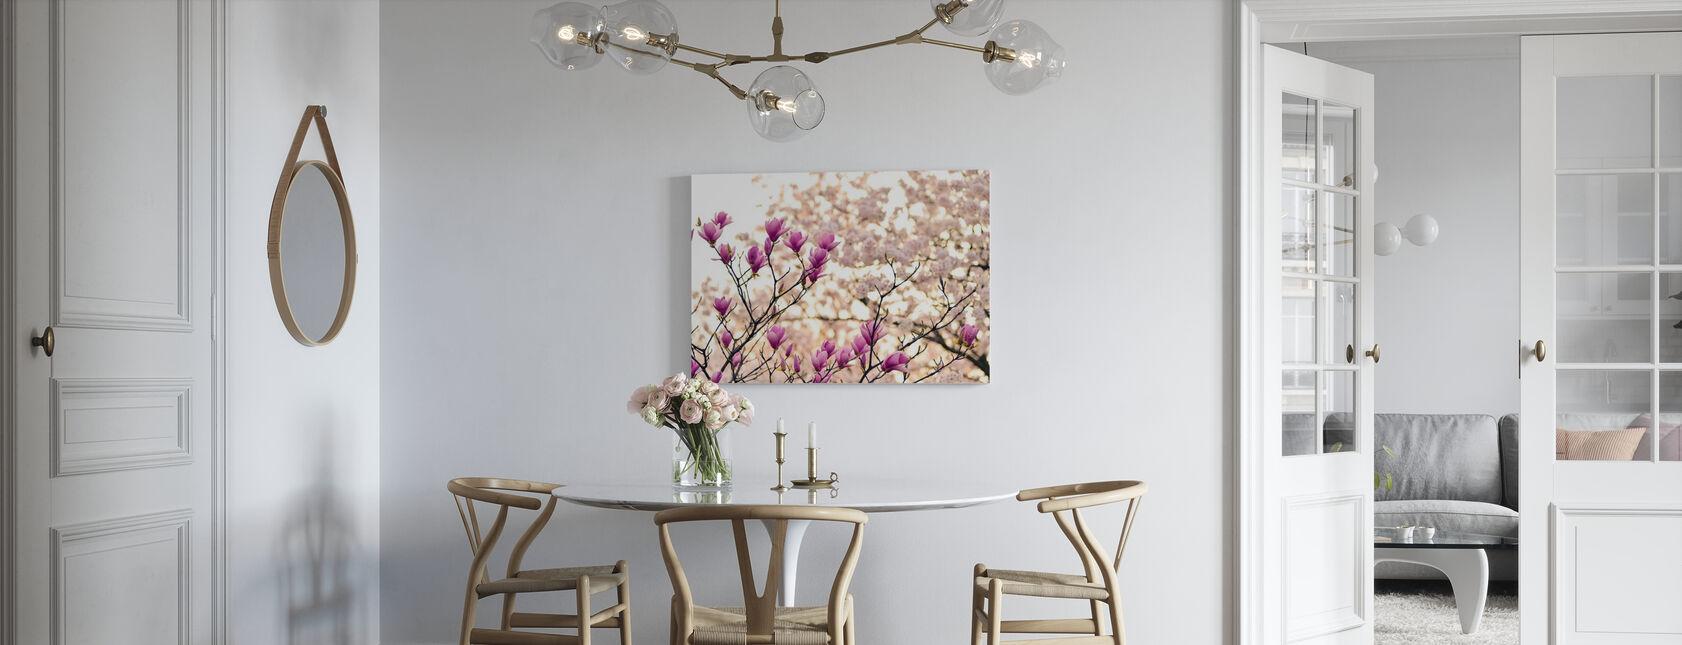 Magnolia Blommor - Canvastavla - Kök